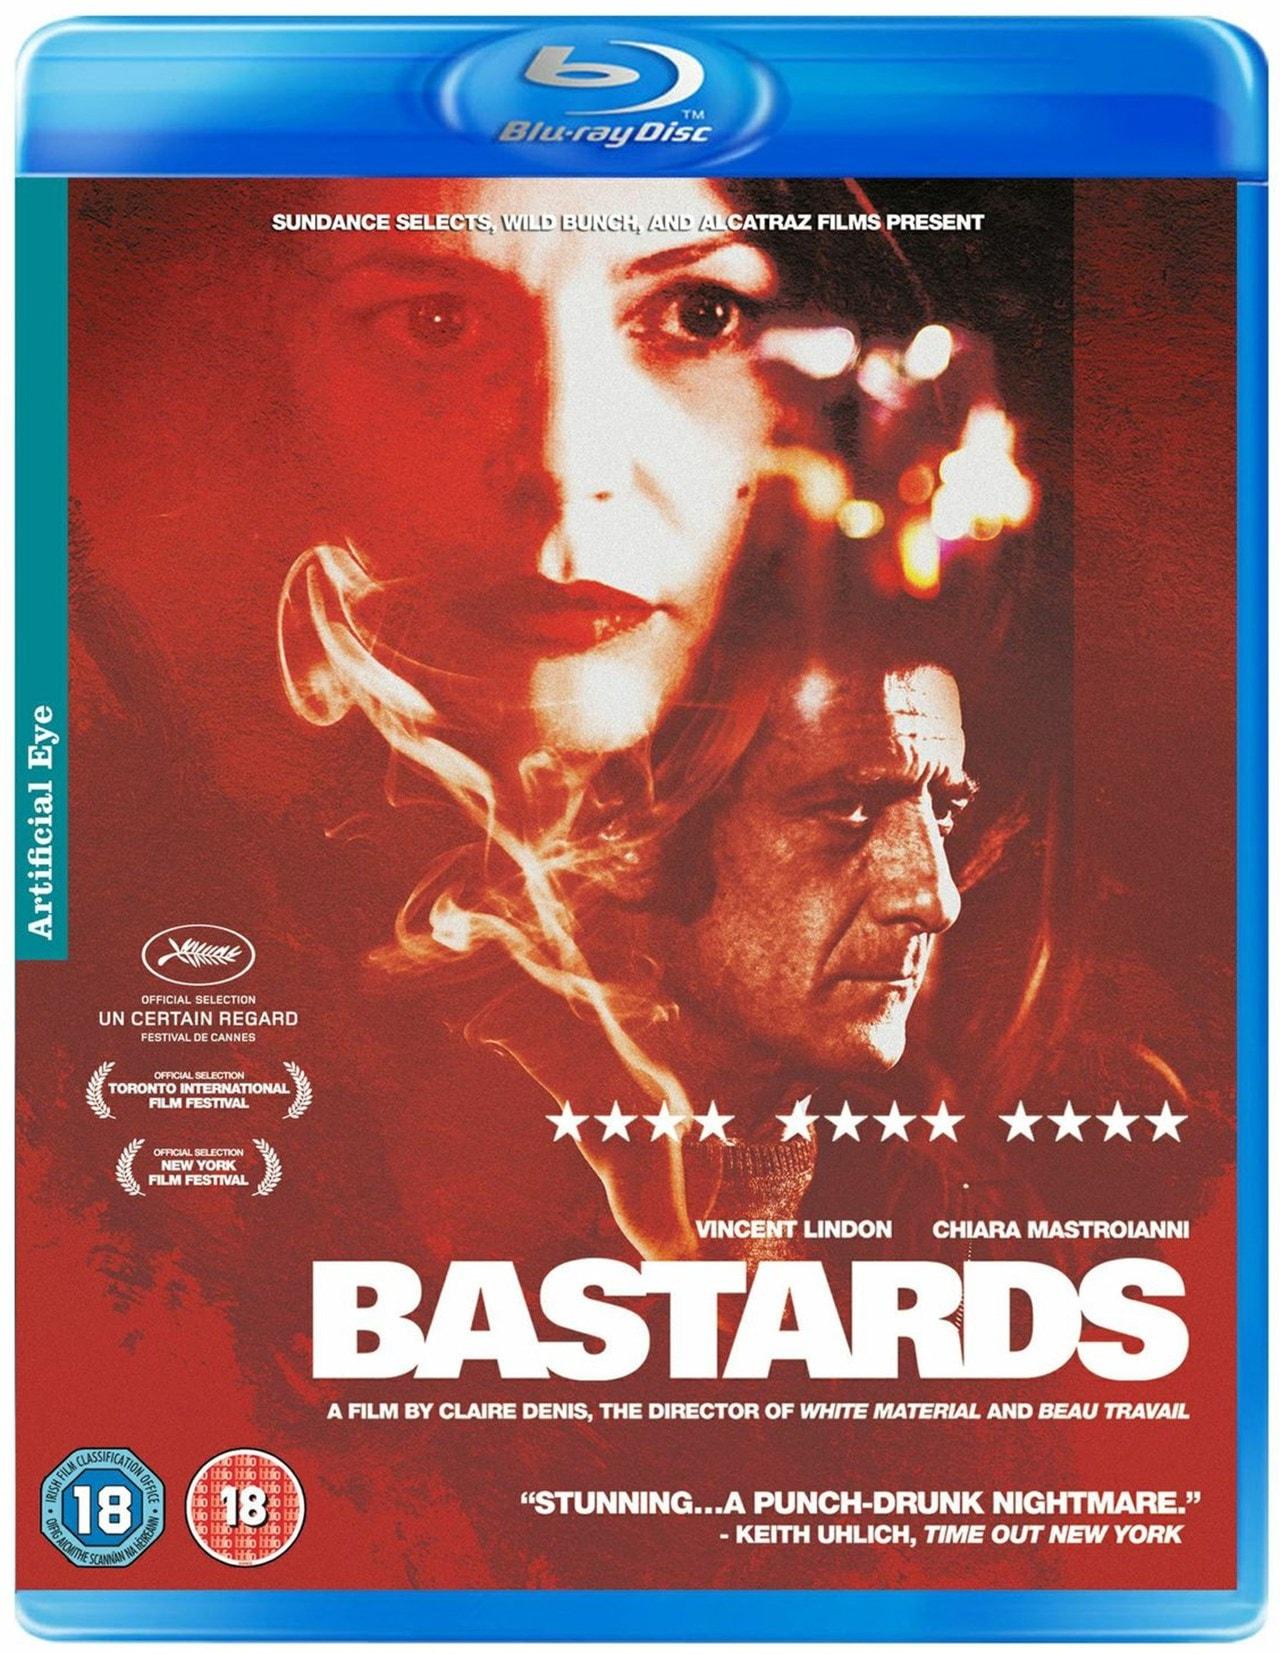 Bastards - 1